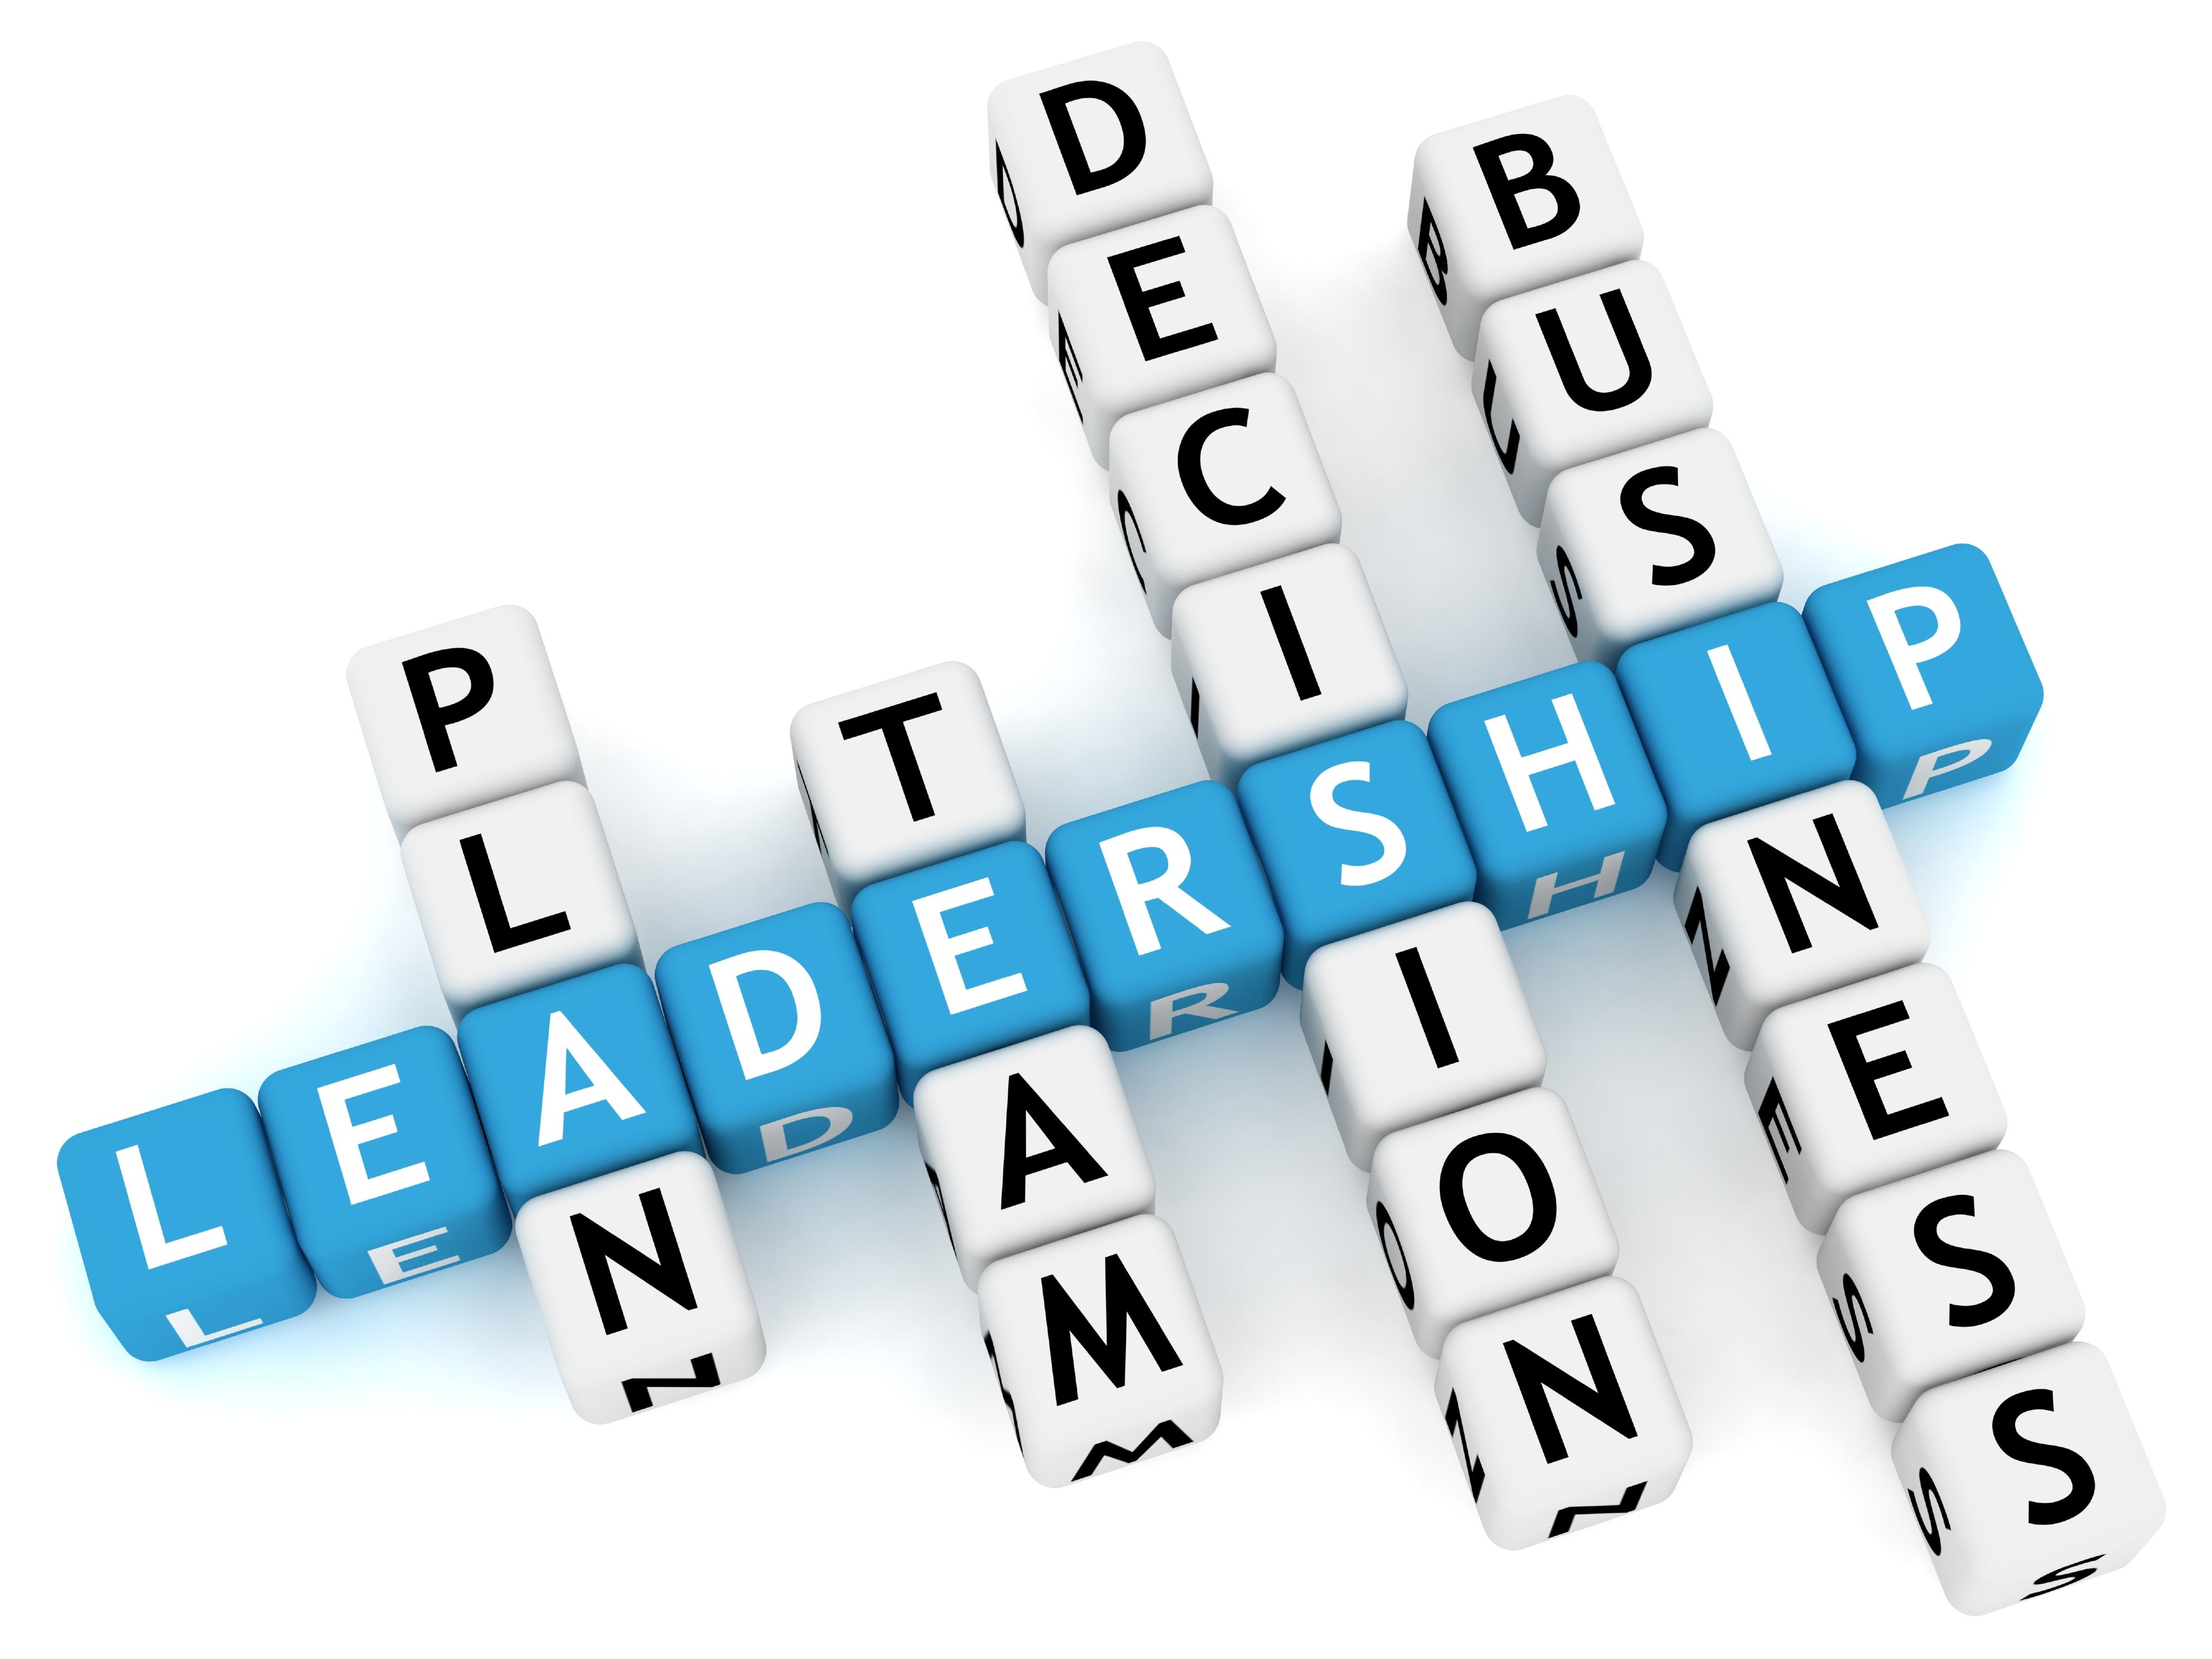 лидери, www.interesnotii.com